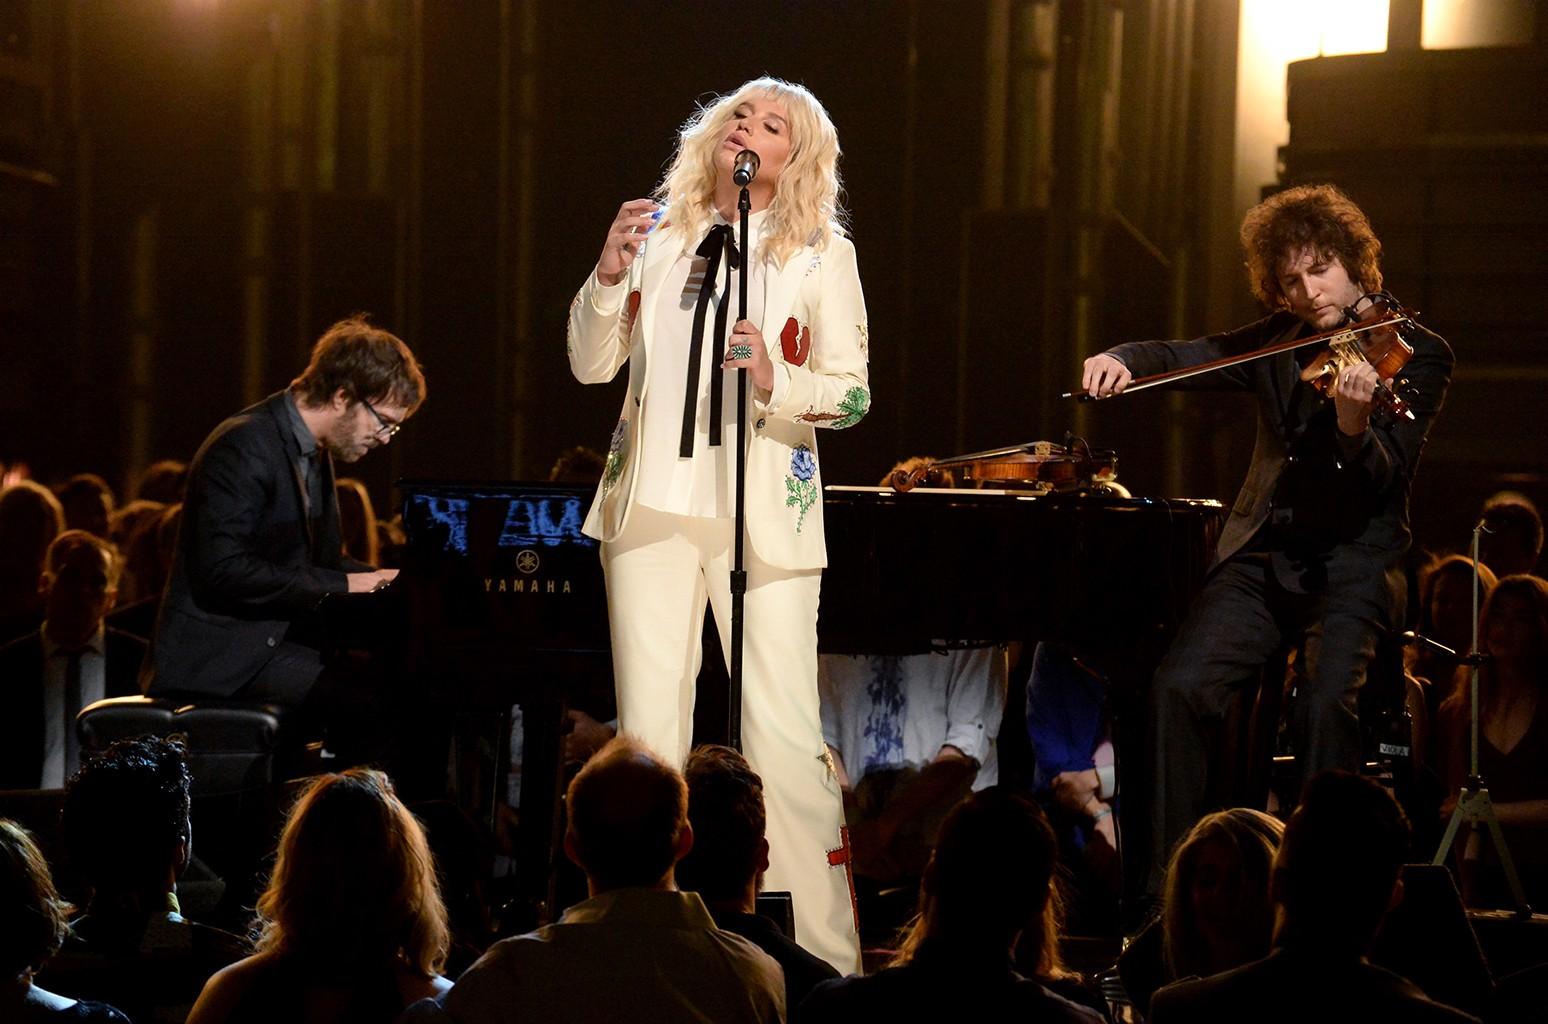 Ben Folds, Kesha and Rob Moose perform at the 2016 Billboard Music Awards